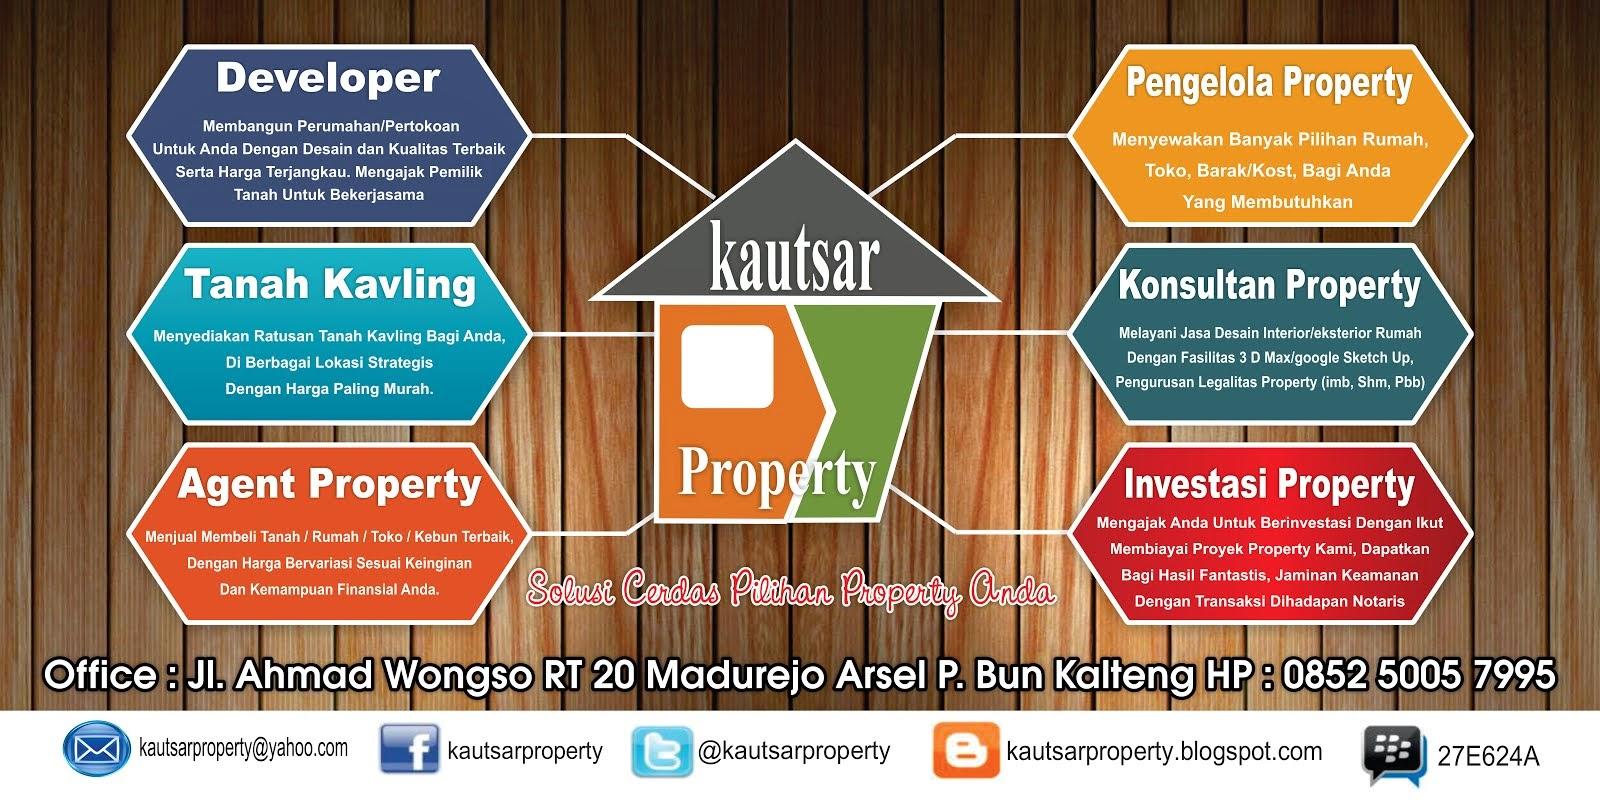 kautsar property